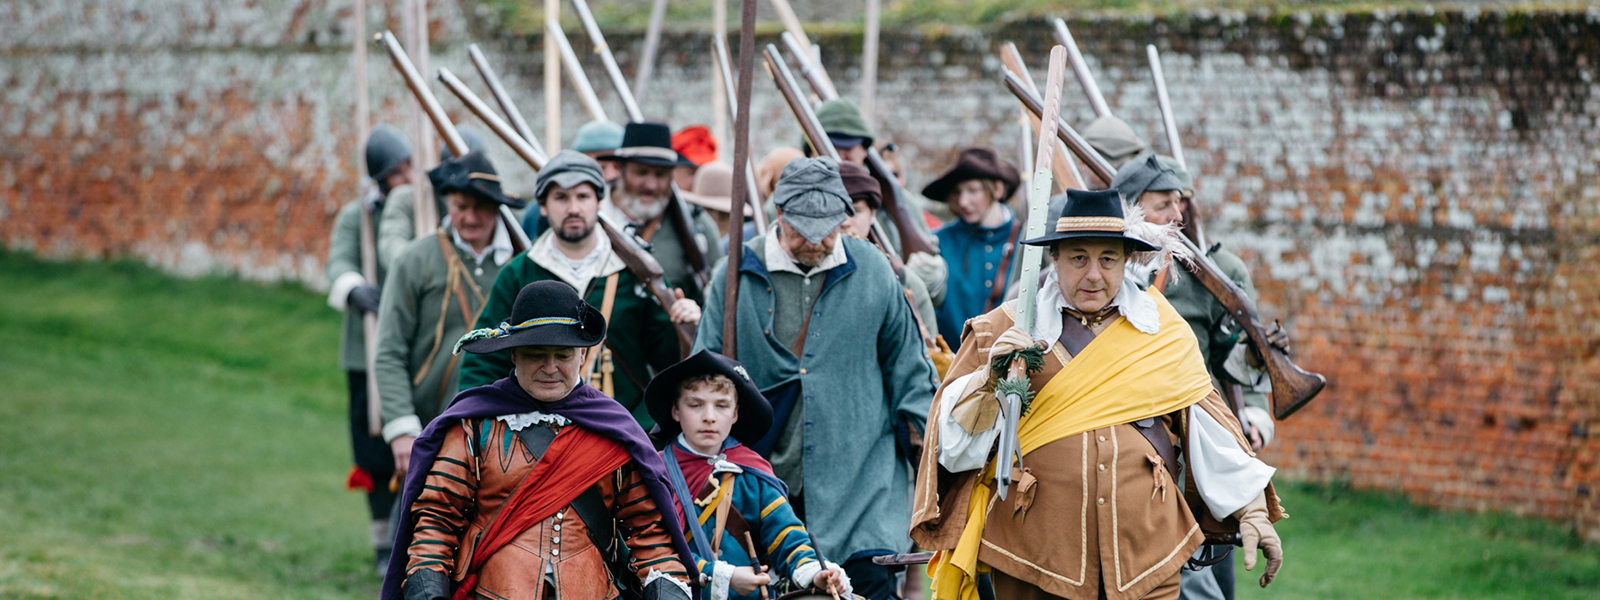 SEALED KNOT Civil War Re-enactment Weekend | Hampshire Cultural Trust